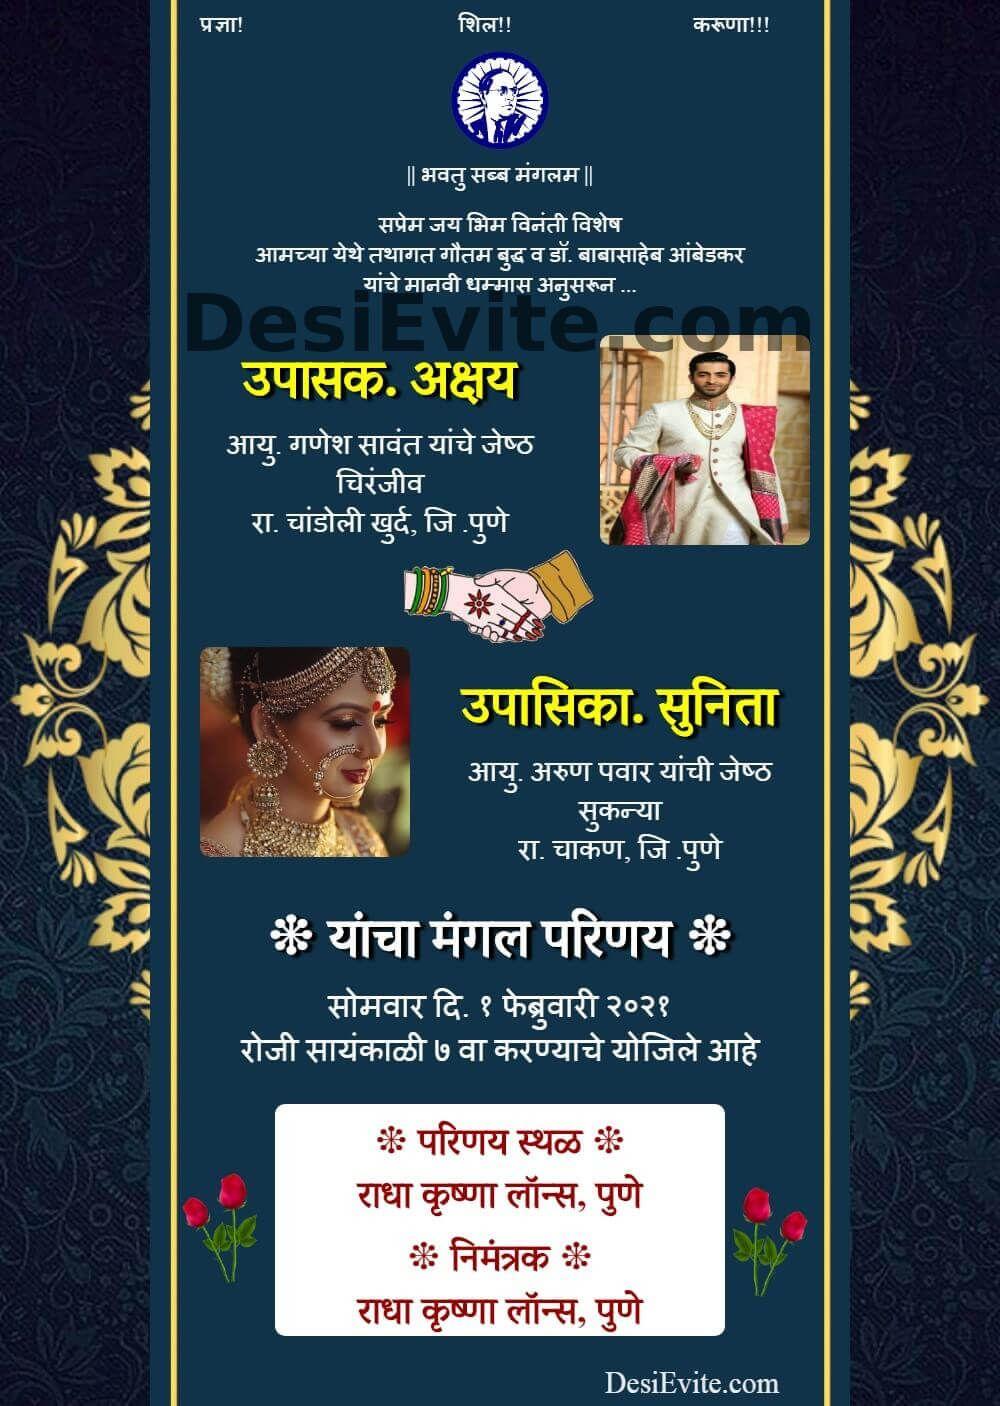 Hindu Wedding Cards Wordings Hindu Wedding Invitations Wordings Hindu Wedding Invitations Wedding Card Wordings Wedding Invitation Matter